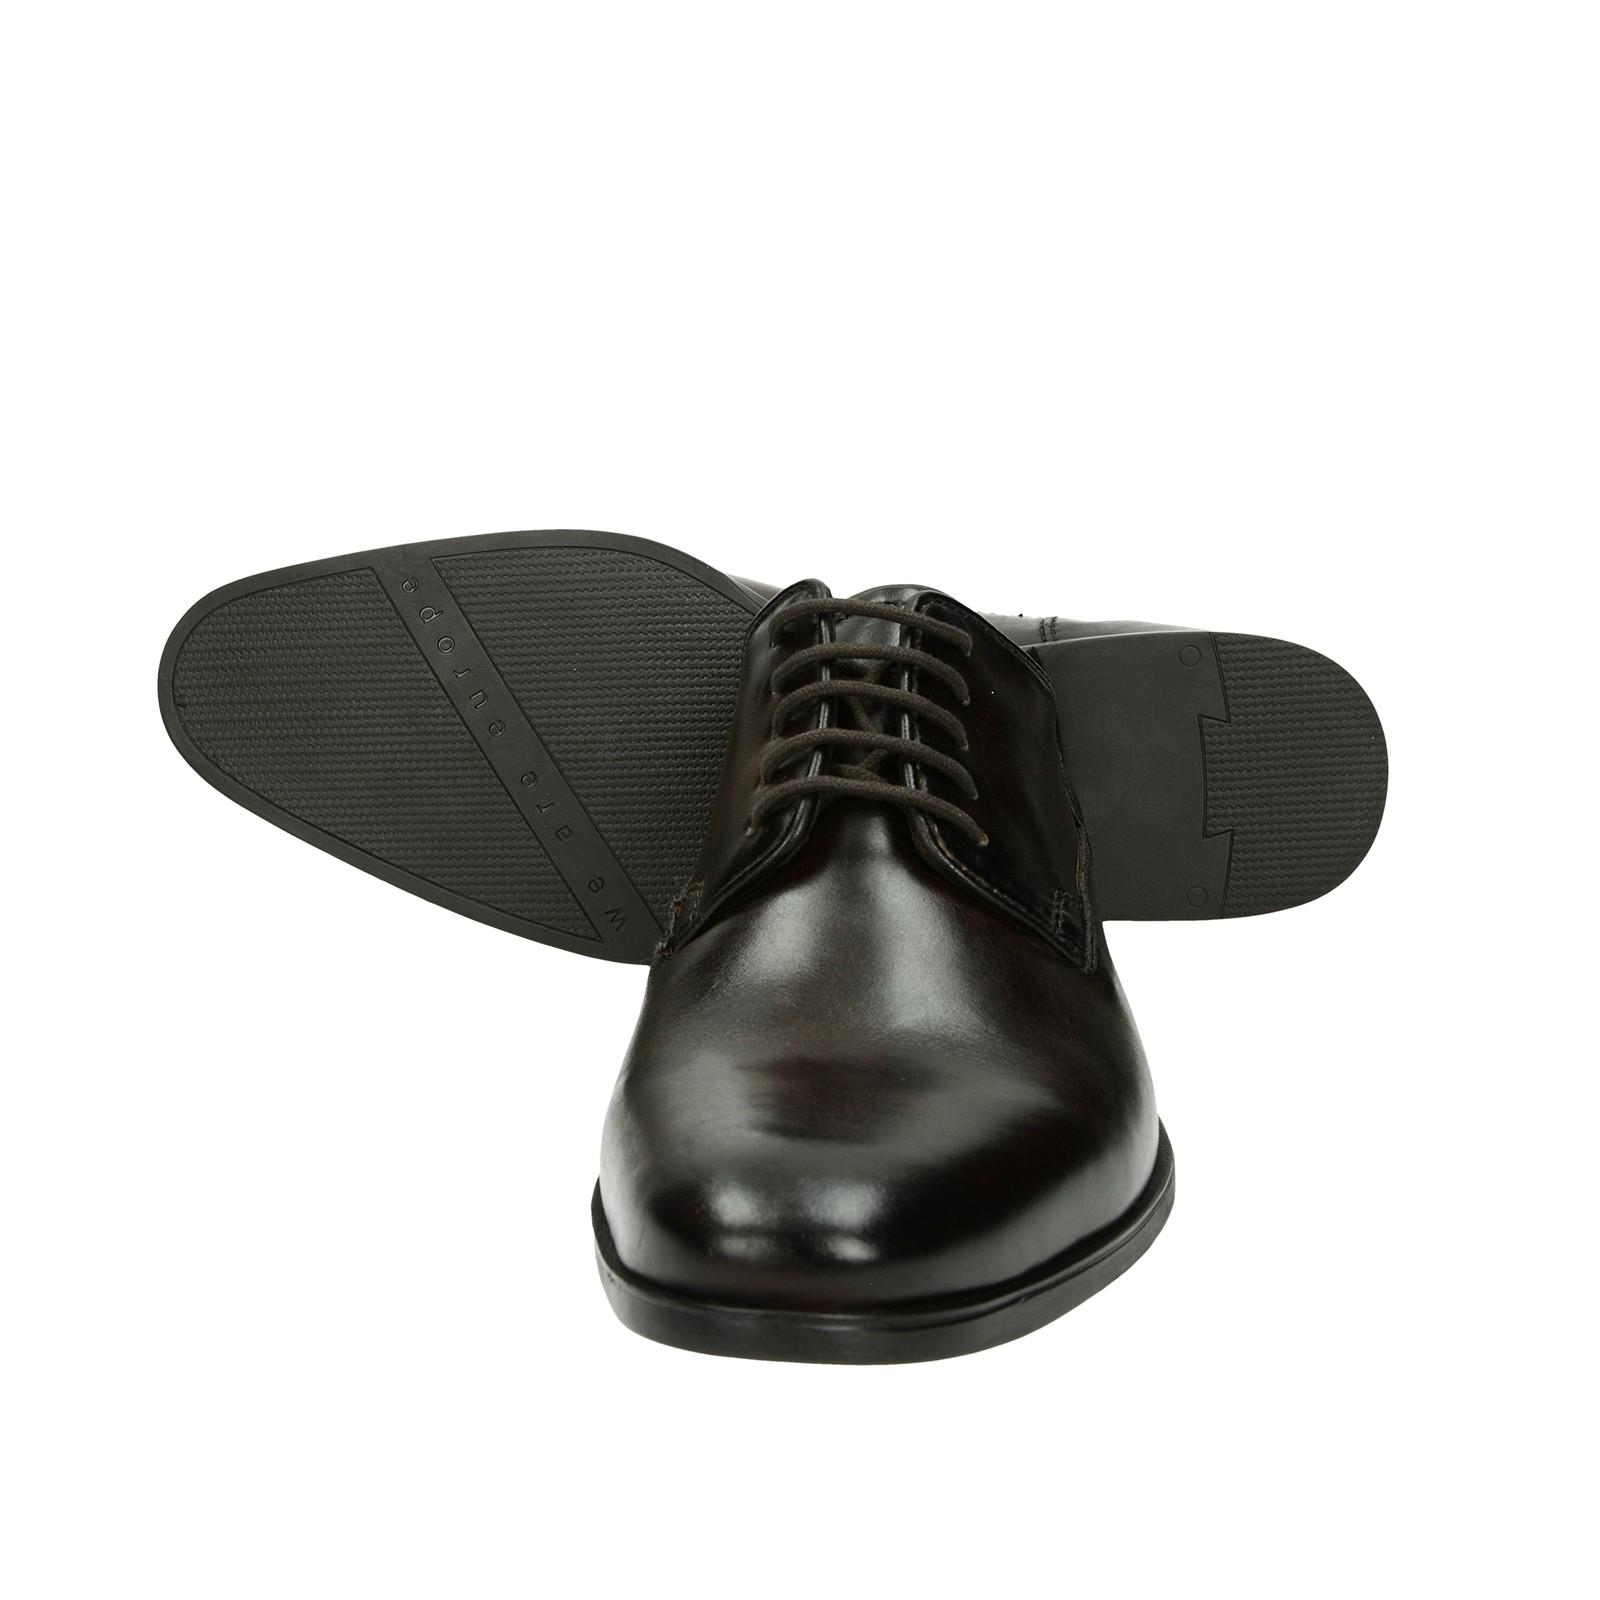 d790d776fd56 ... Bugatti pánske spoločenské kožené topánky - tmavohnedé ...